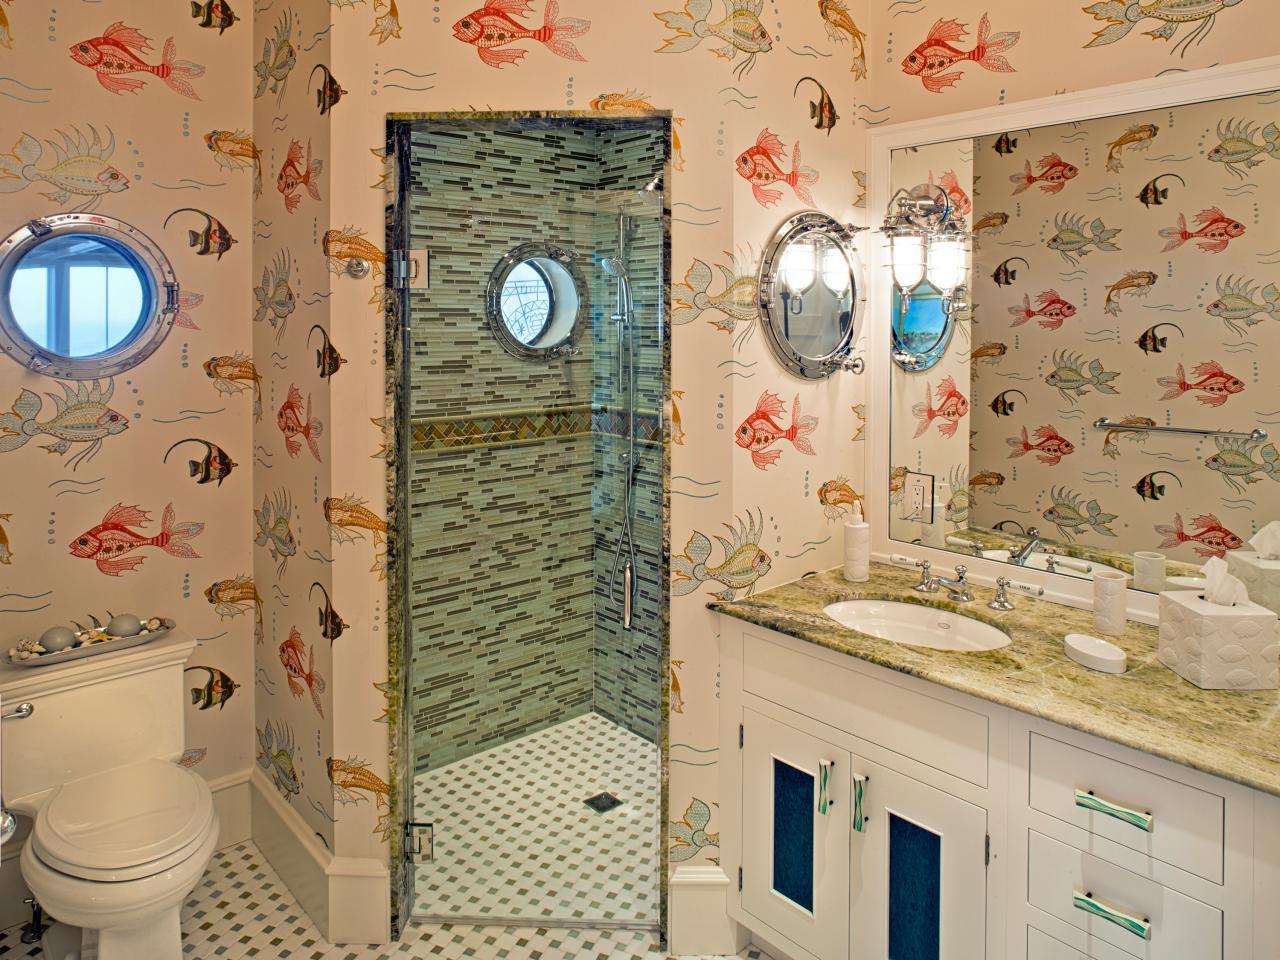 Modifierat sjöjungfru badrum